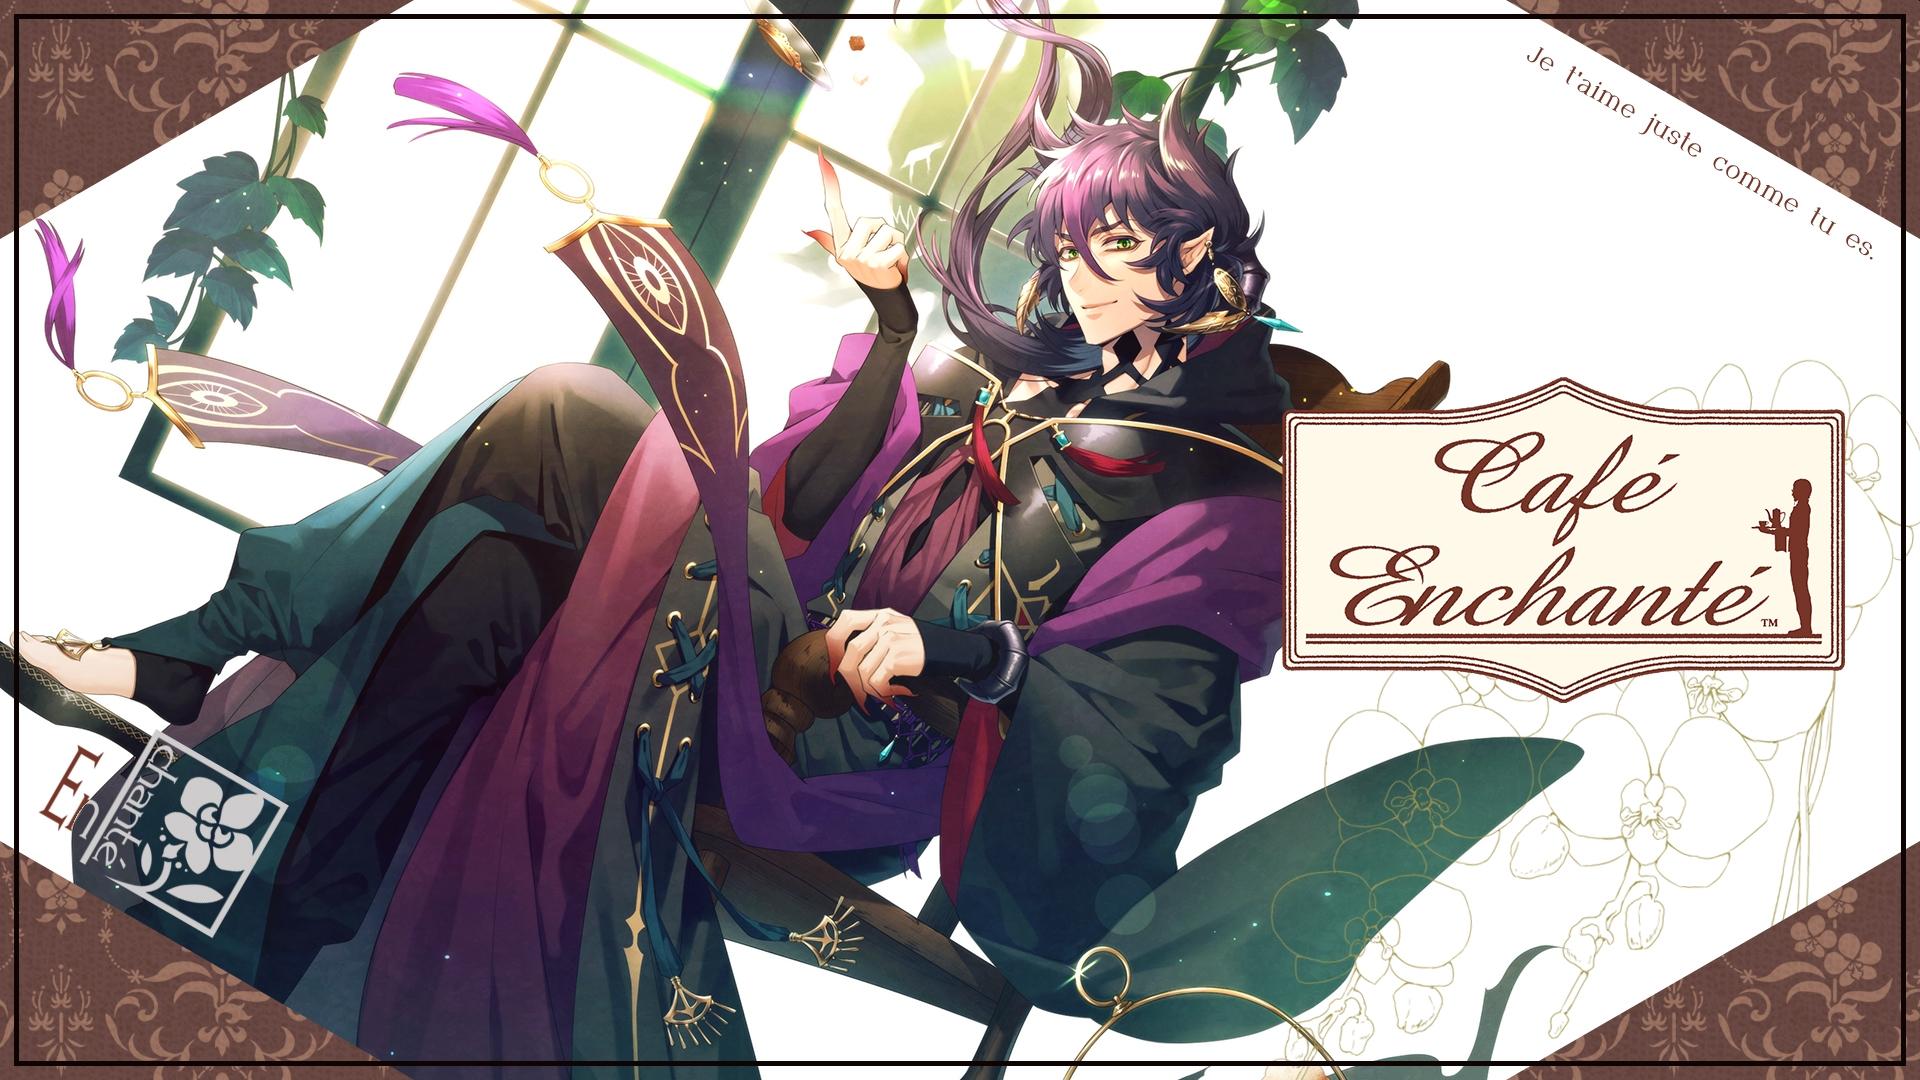 Visual Novel Café Enchanté Launches On The Nintendo Switch On November 5